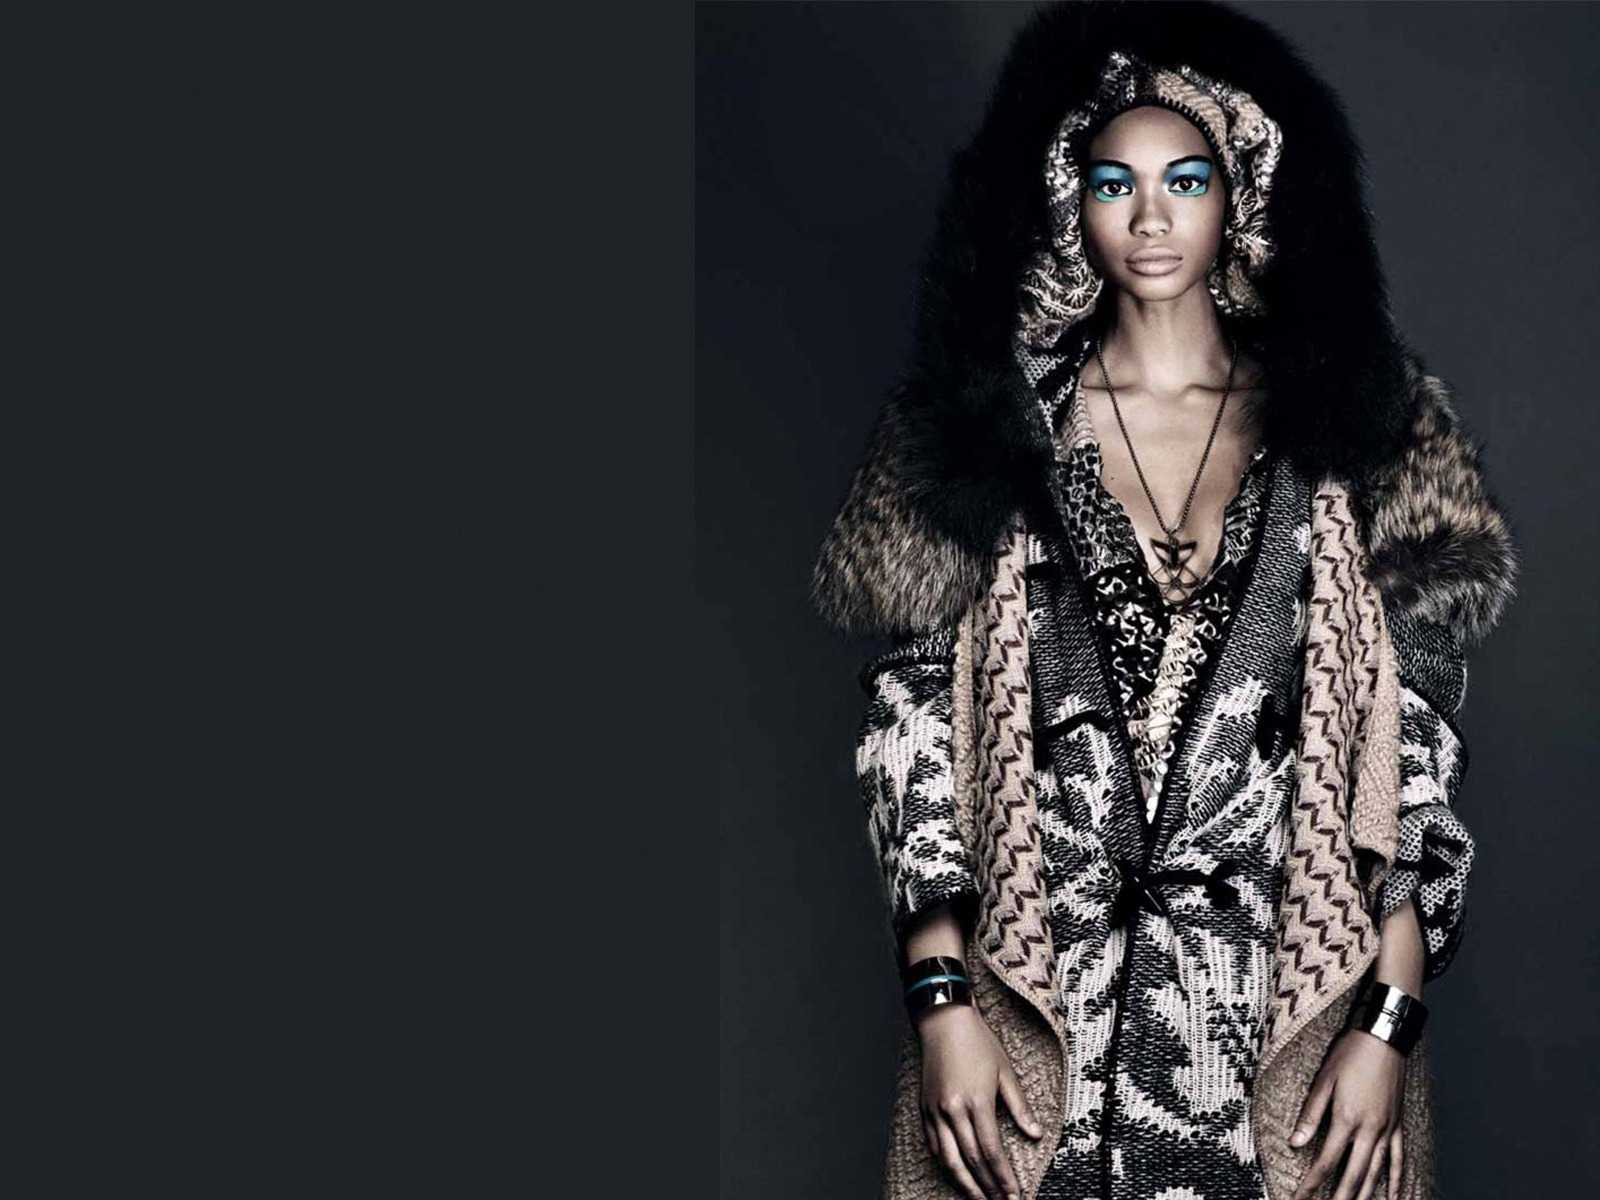 Chanel Iman High Definition